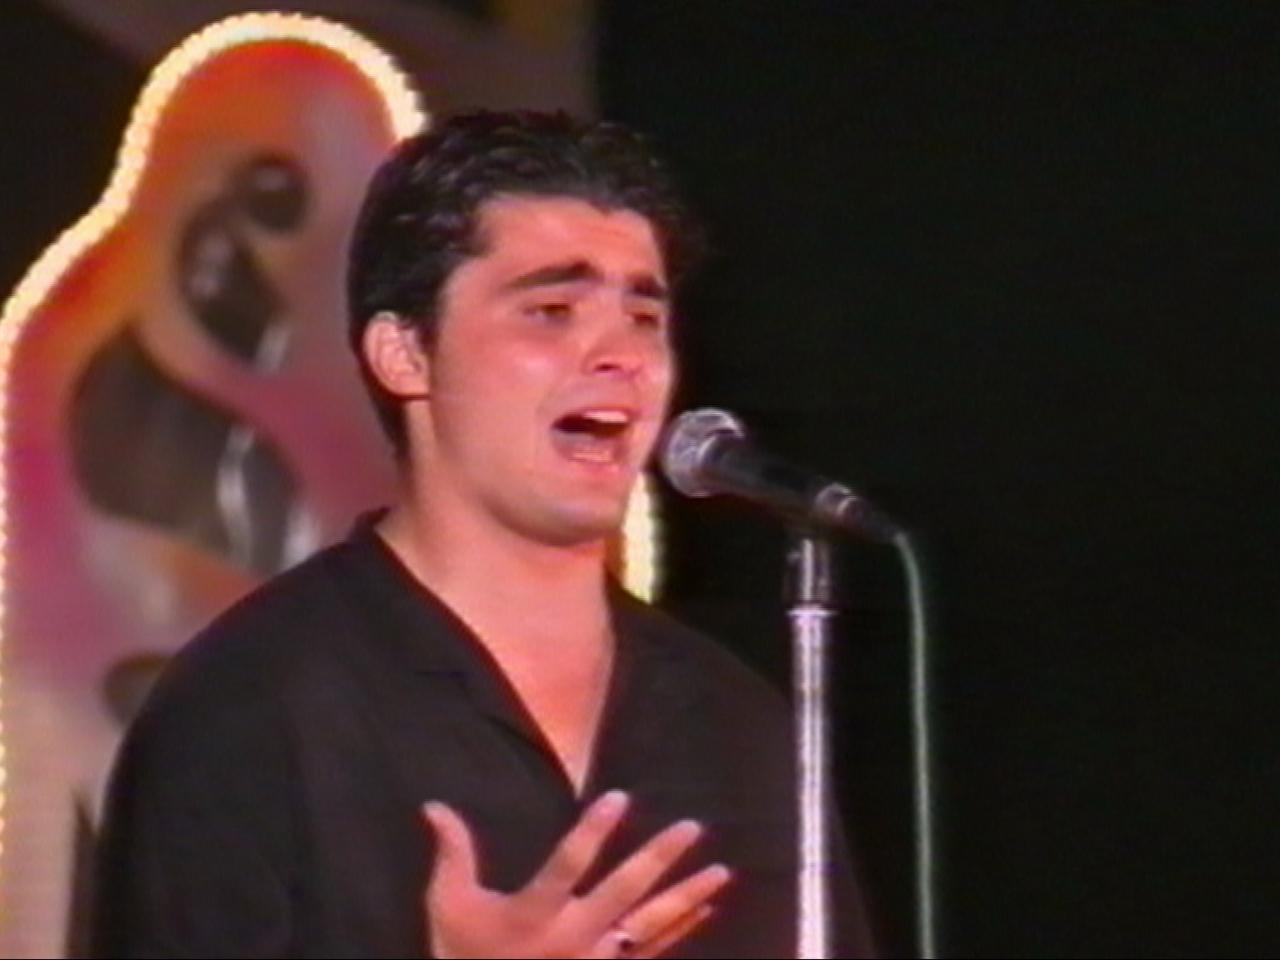 Amara 1999 - Premiul 1 - Pepe - Latin Expres.jpg